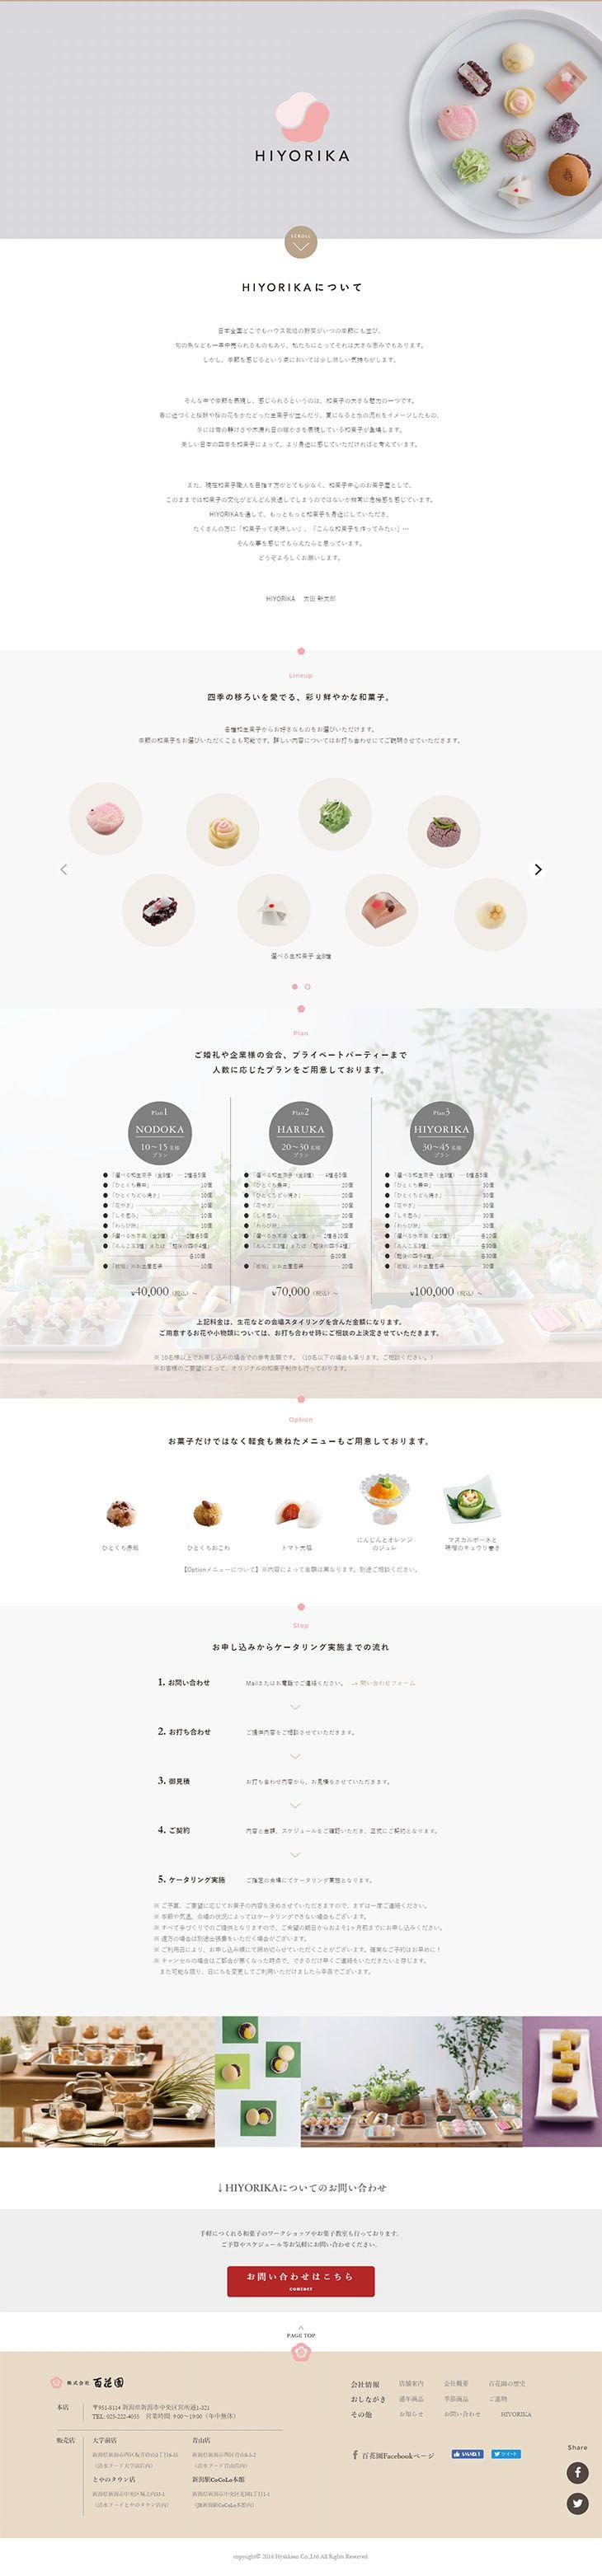 HIYORIKA【食品関連】のLPデザイン。WEBデザイナーさん必見!ランディングページのデザイン参考に(シンプル系)